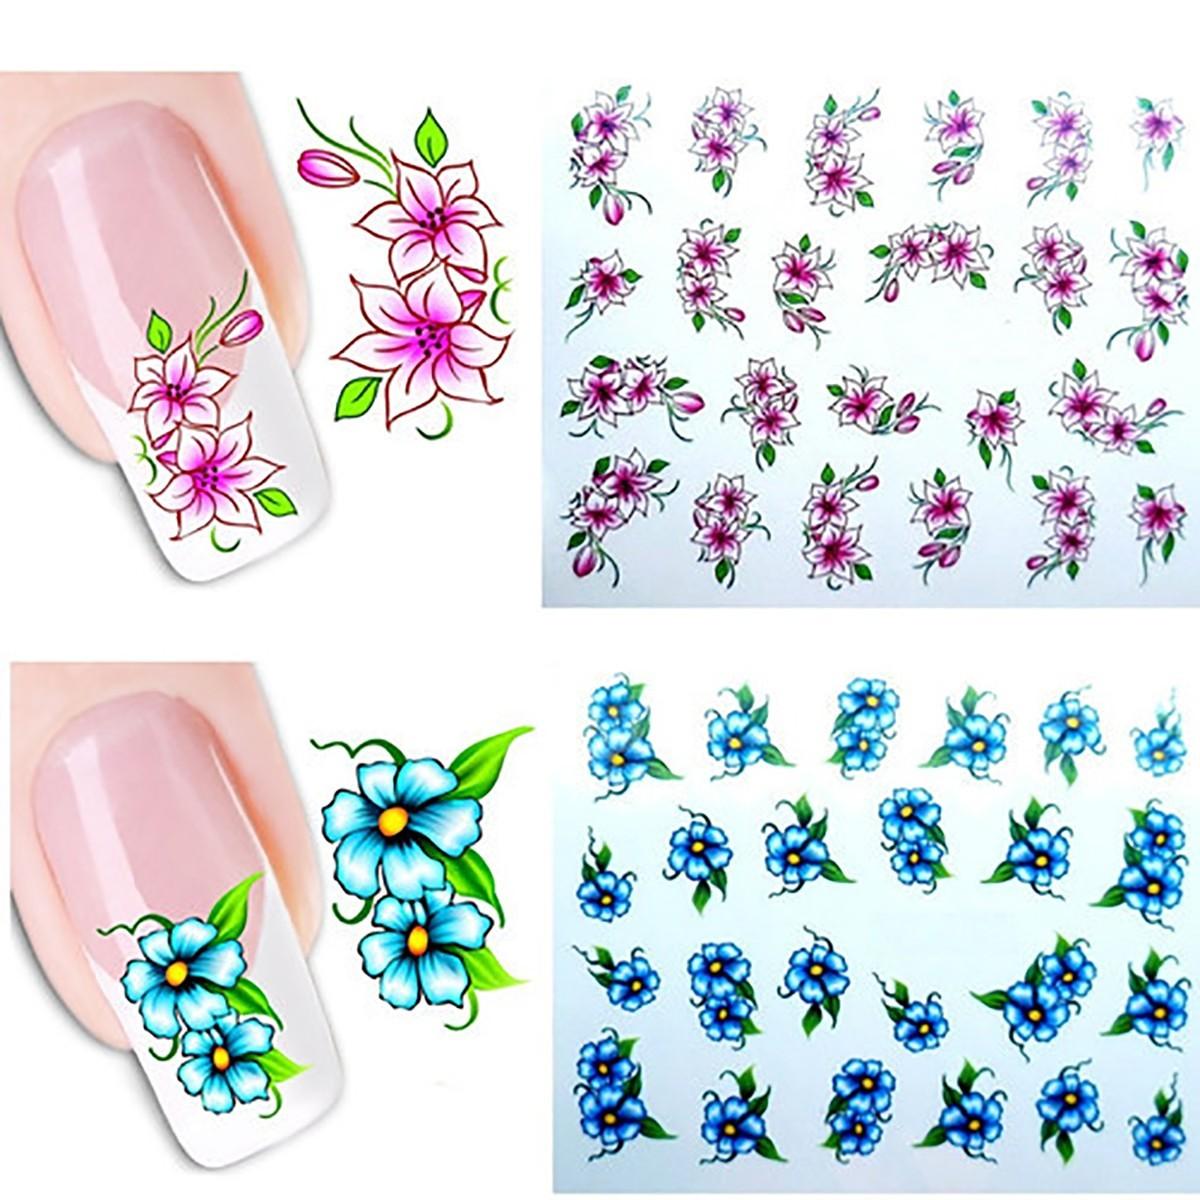 Kit De Tatto Mariposas Para Uñas Stickers Al Algua Nail